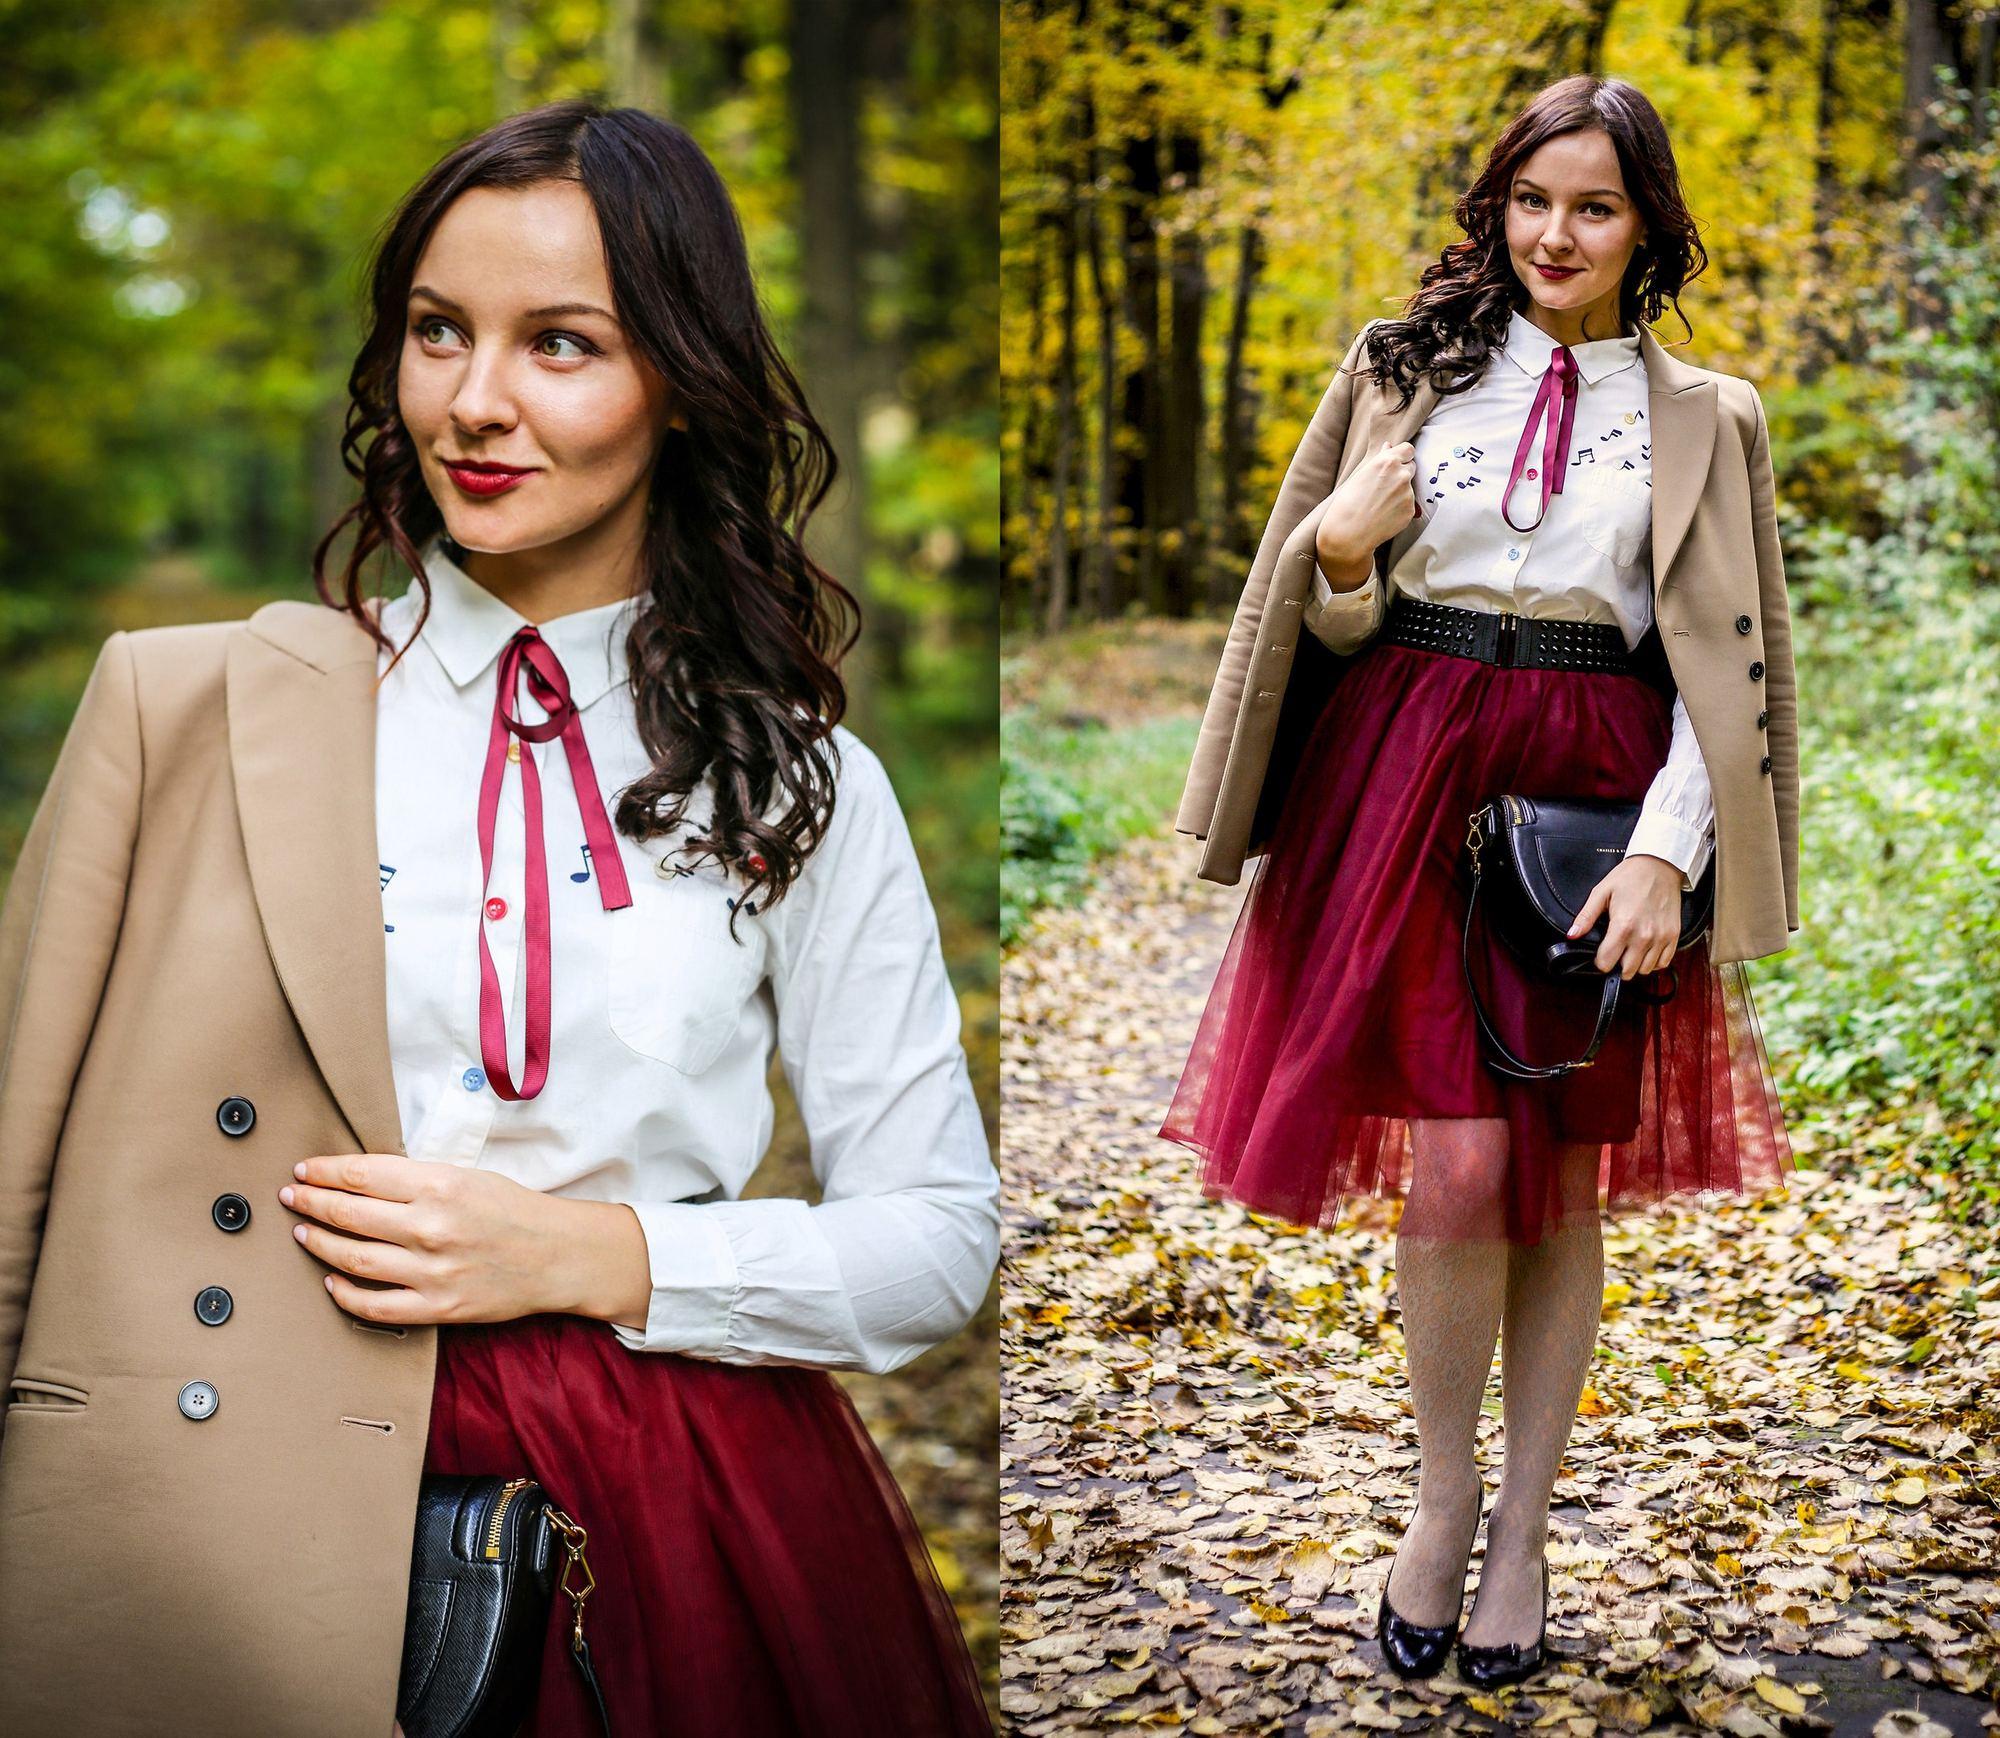 Фото Уличный стиль фото Осень от Julia Fetisova